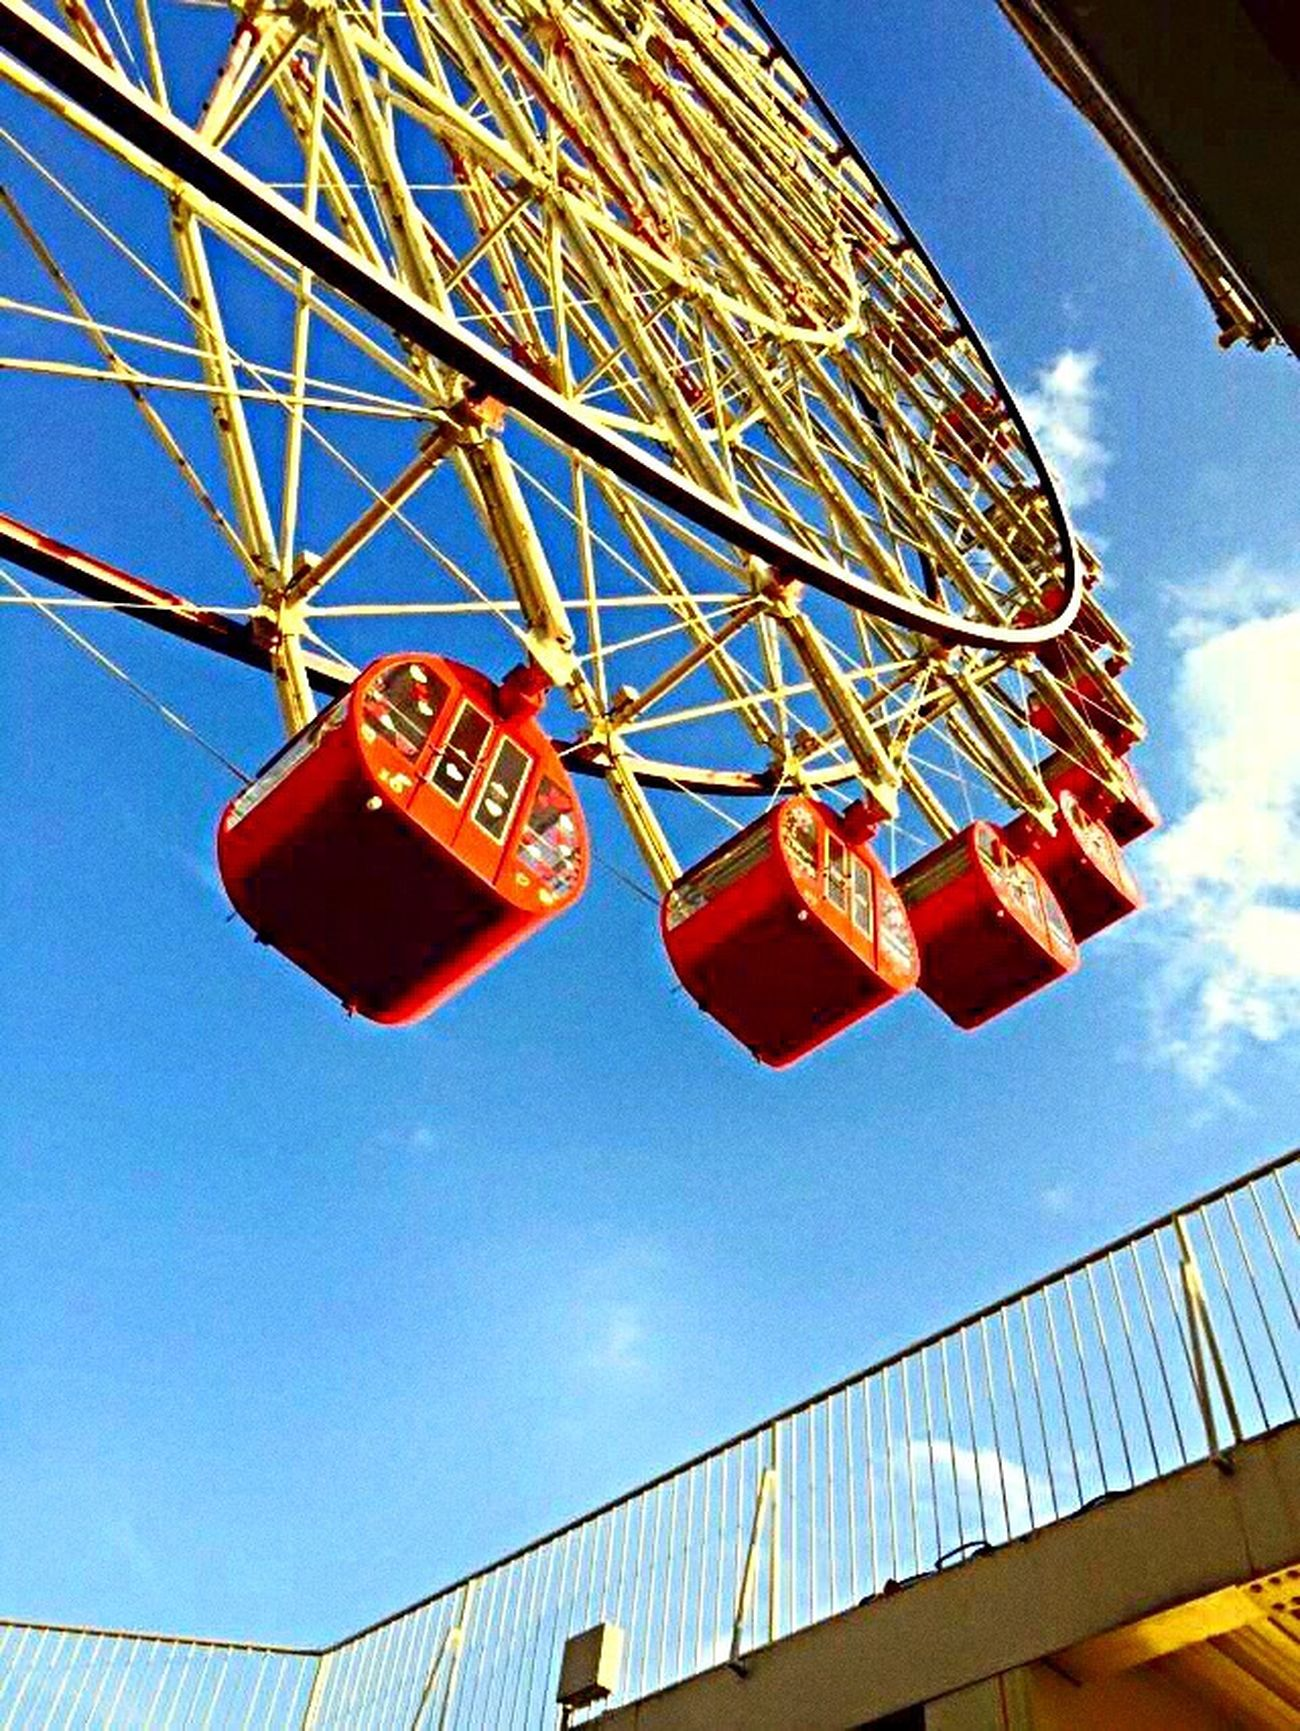 EyeEm Taking Photos Enjoying Life Nagoya Port Ferris Wheel JapanLife